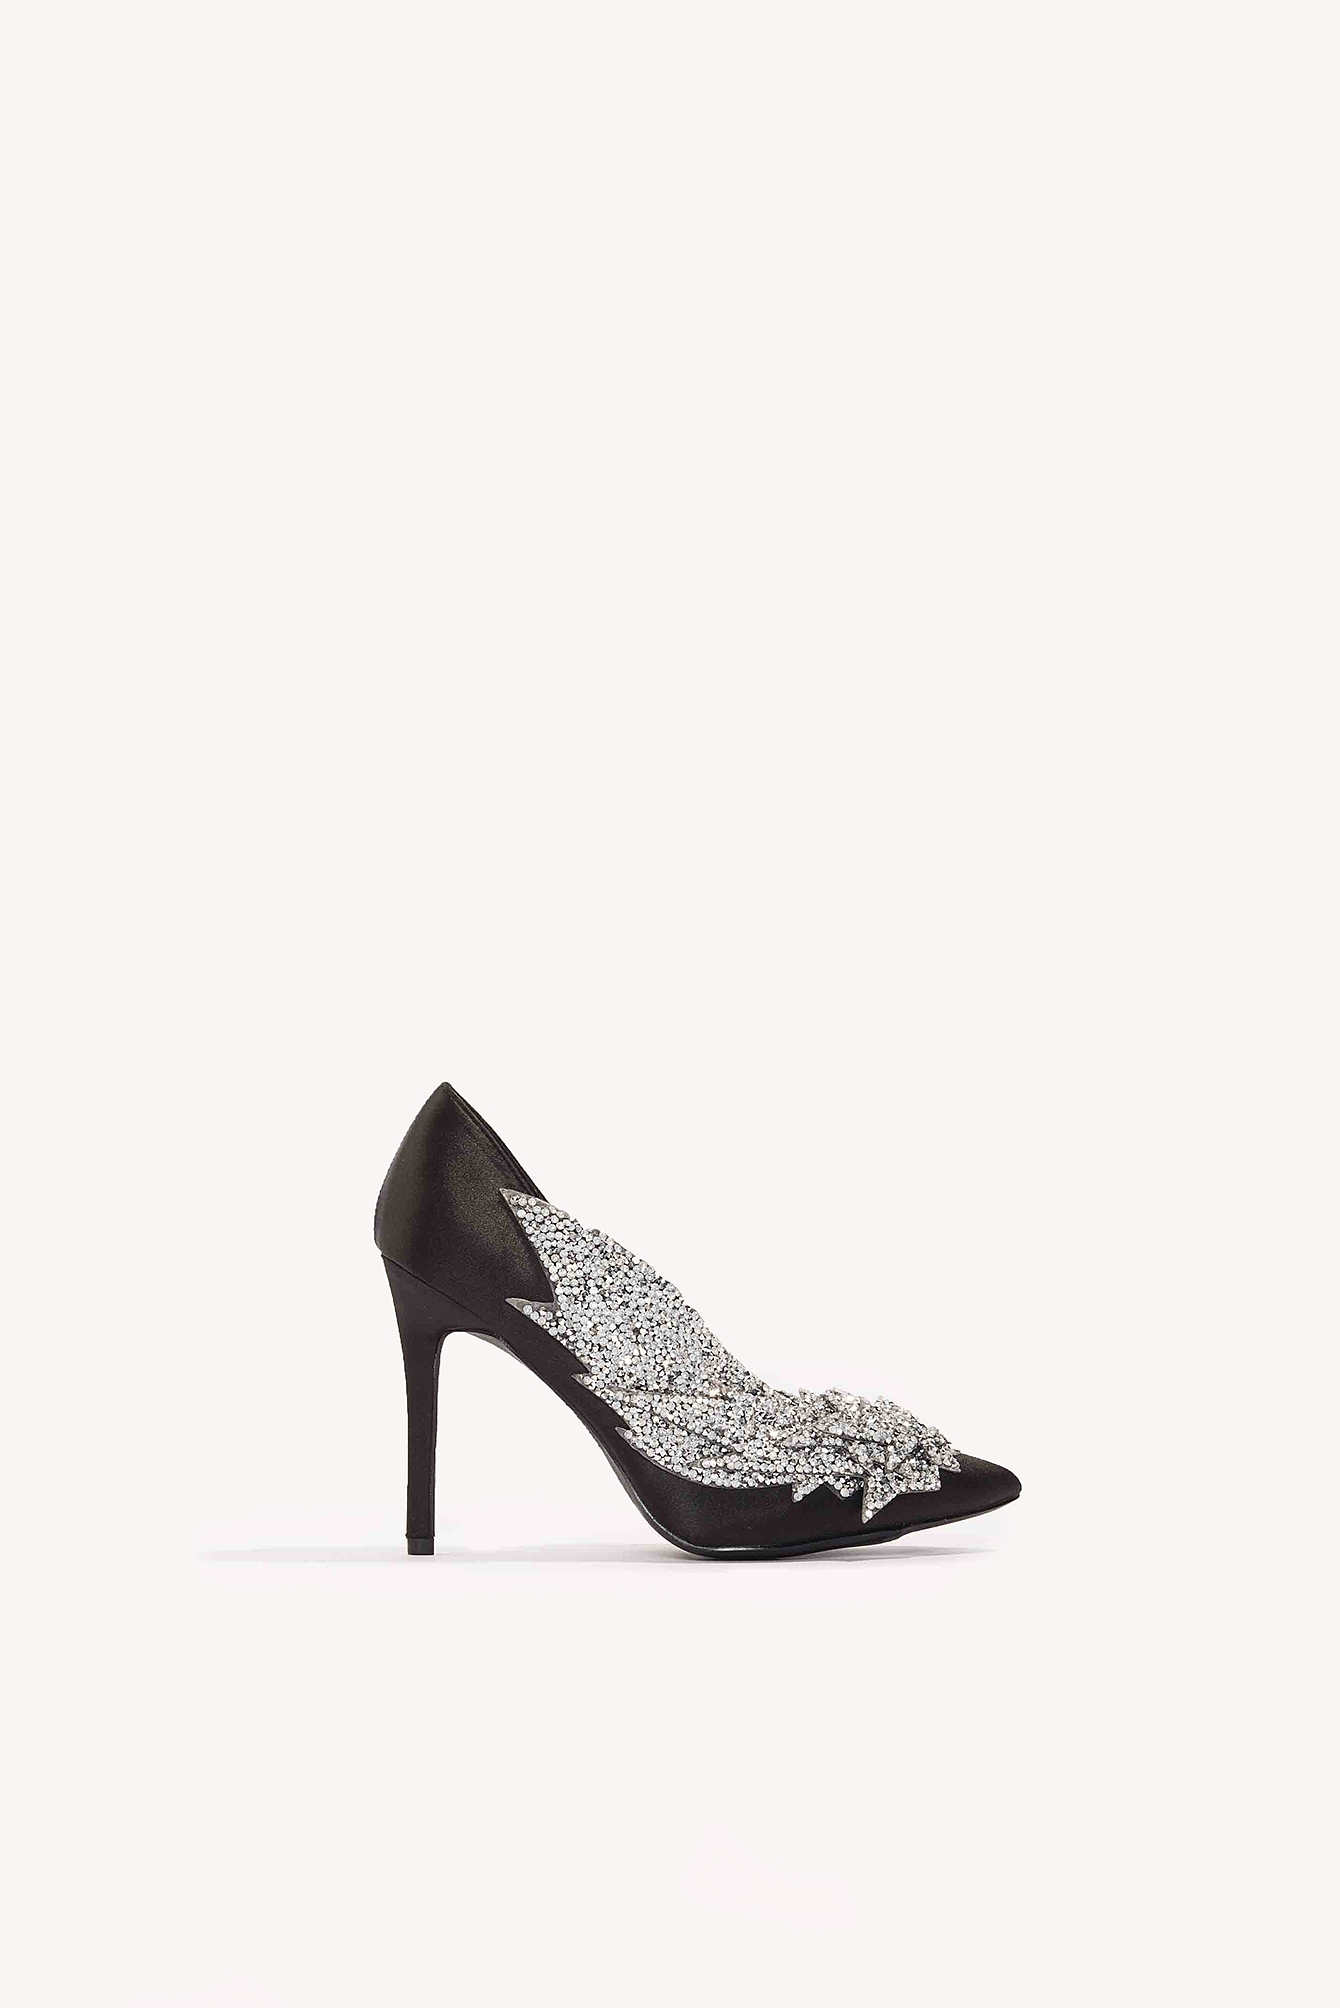 NA-KD Shoes Detail Rhinestone Pumps Black